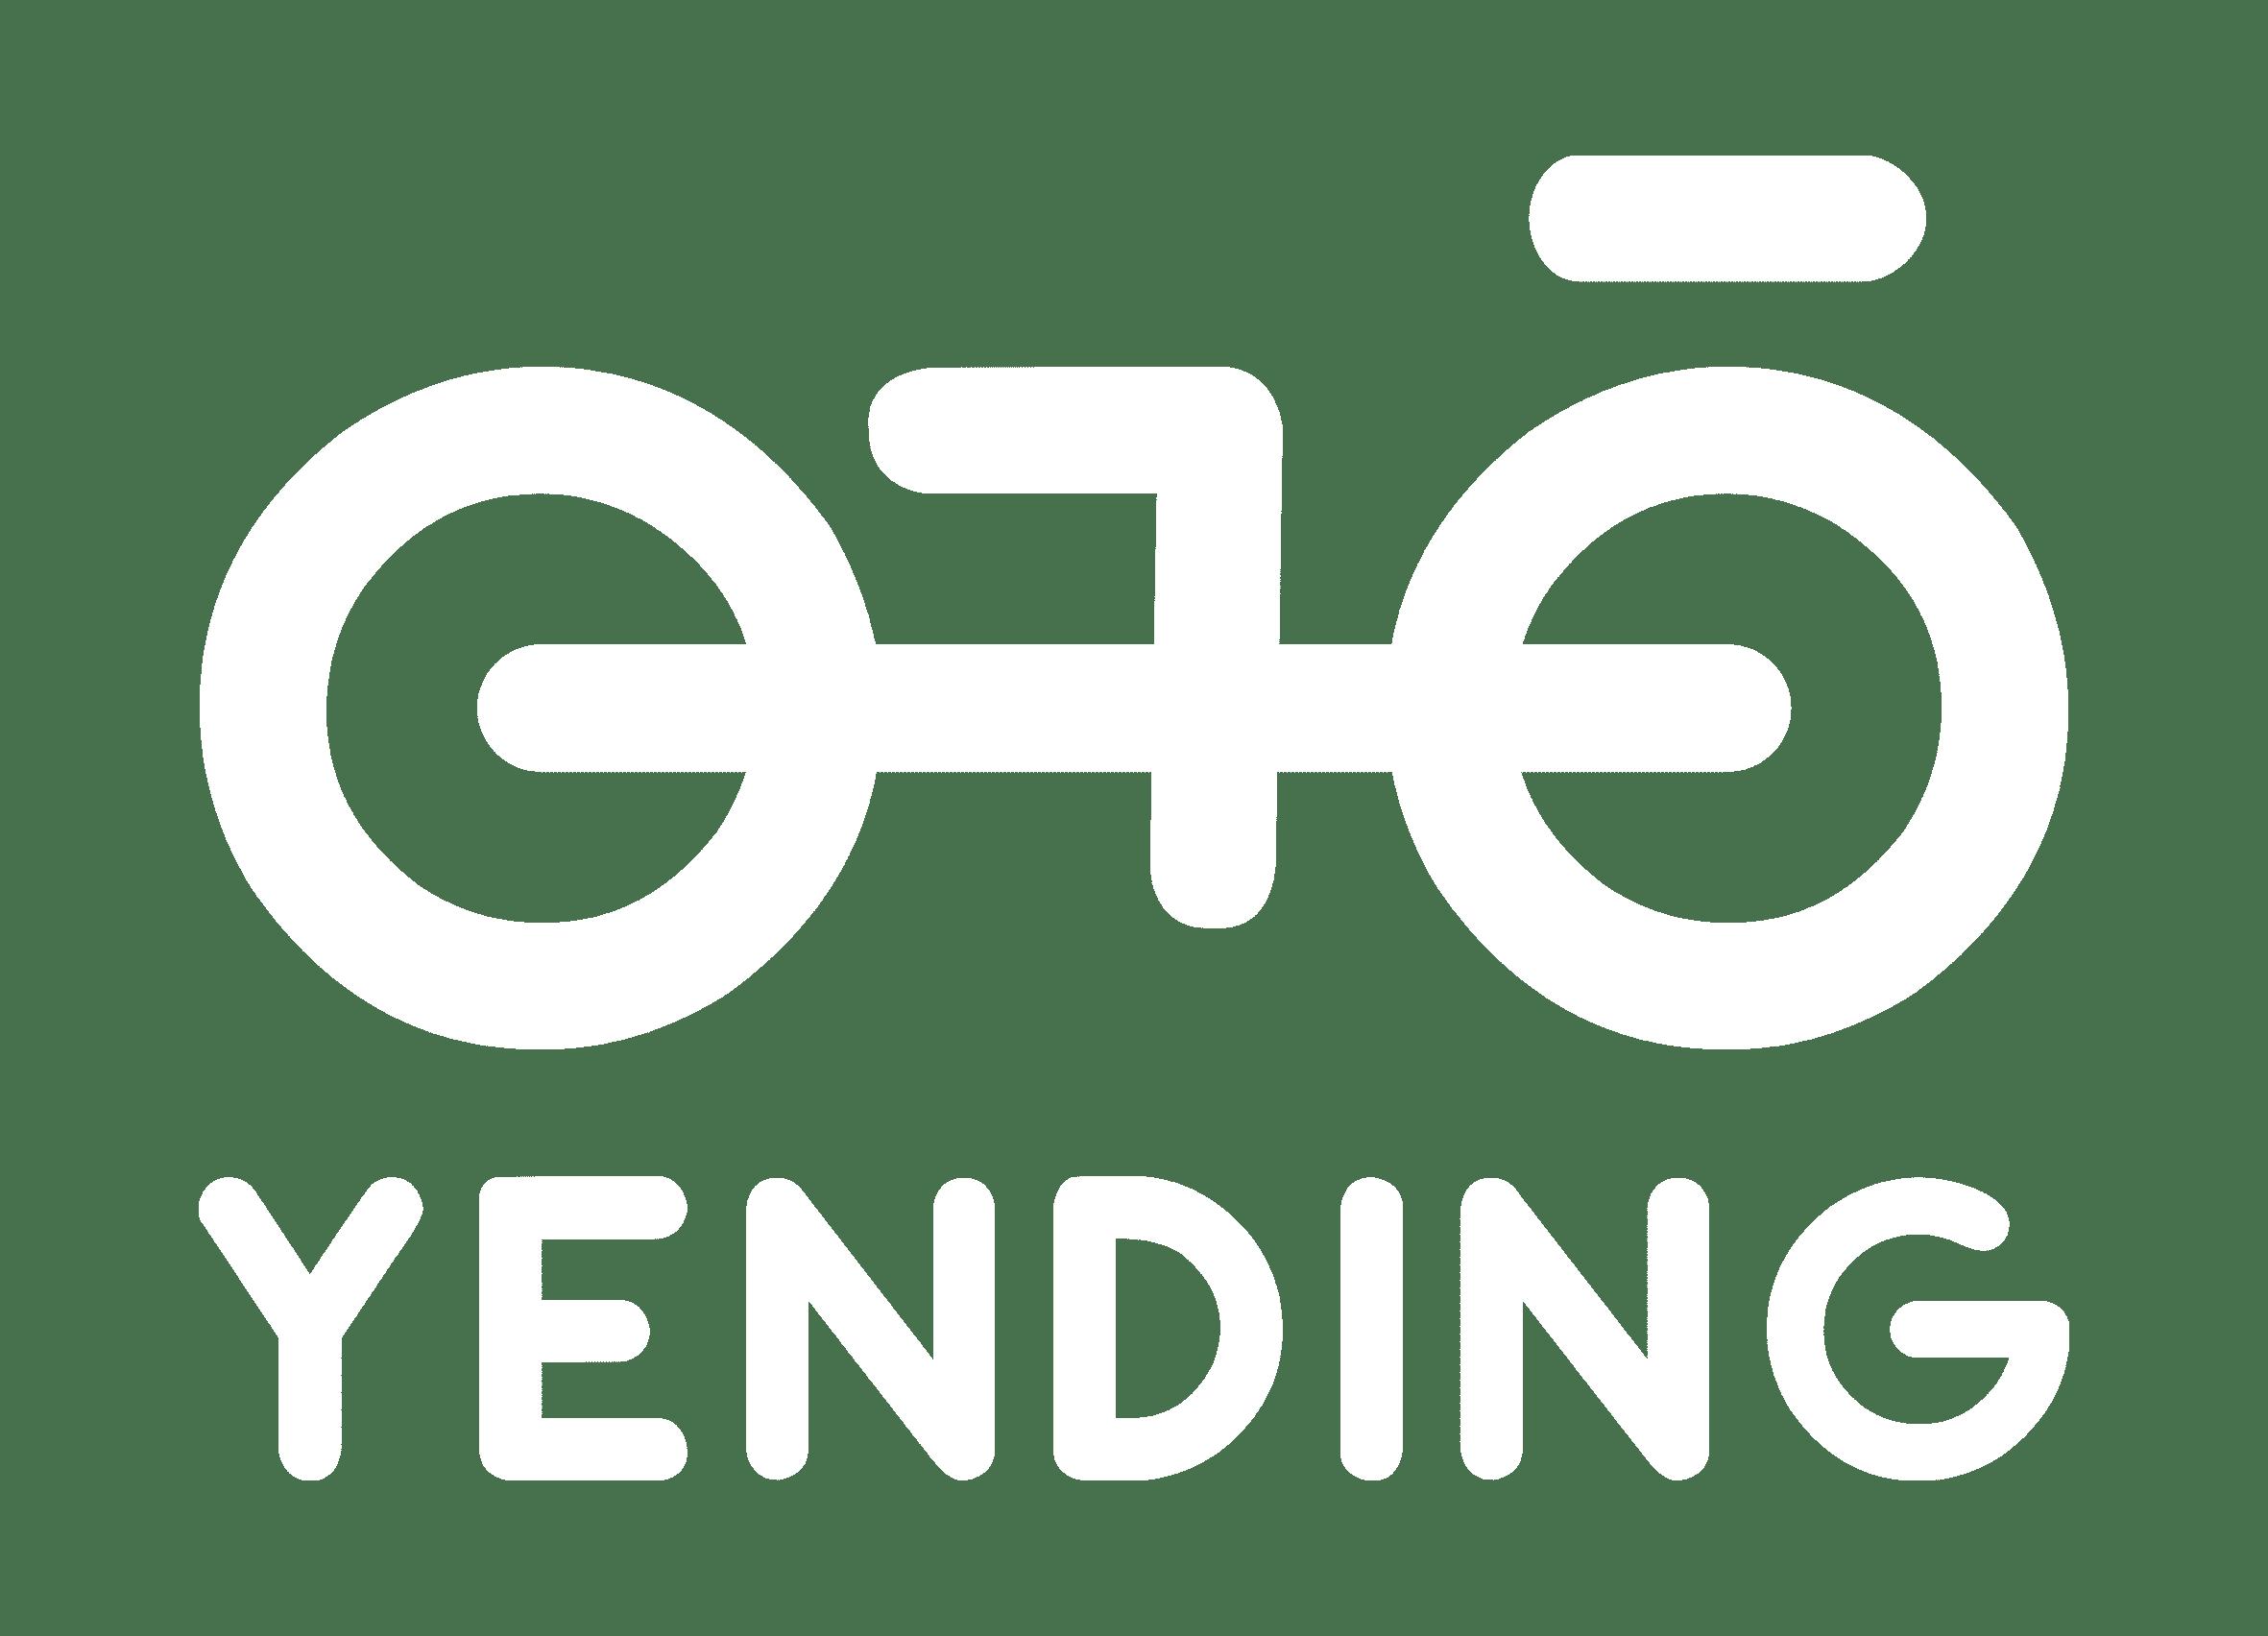 YENDING